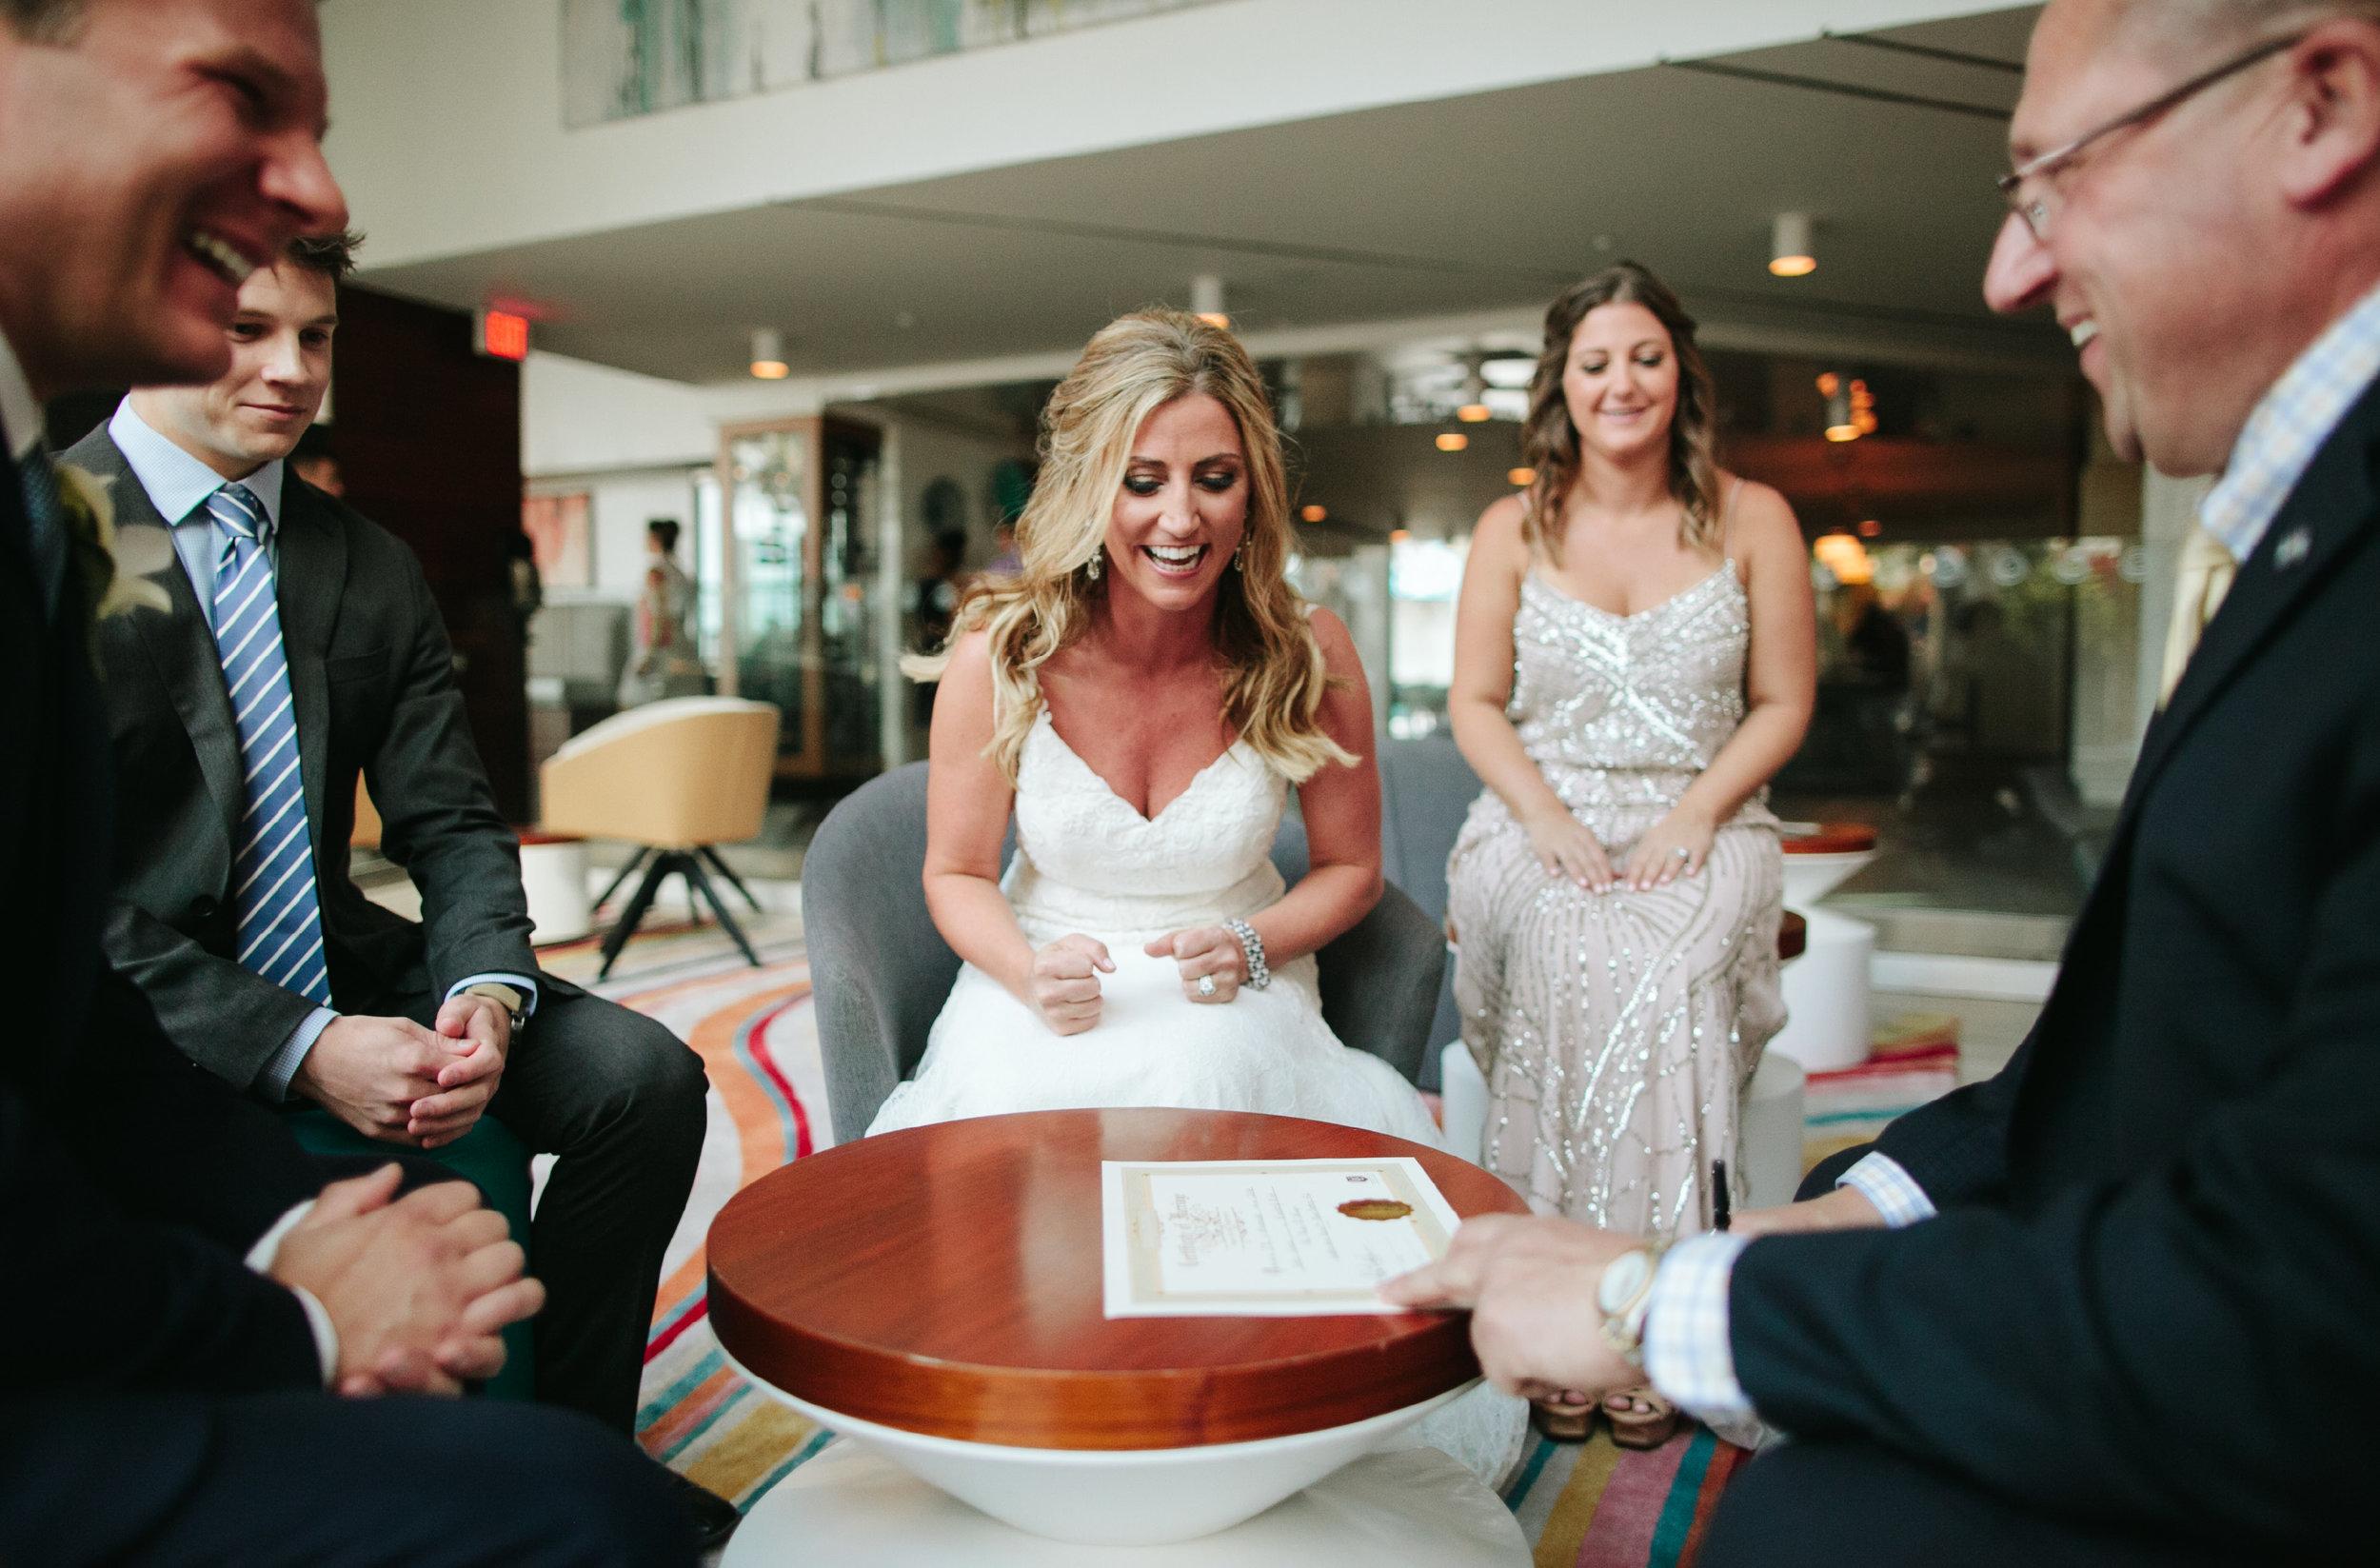 Kim + John's Wedding at the Waterstone Hotel in Boca Raton57.jpg